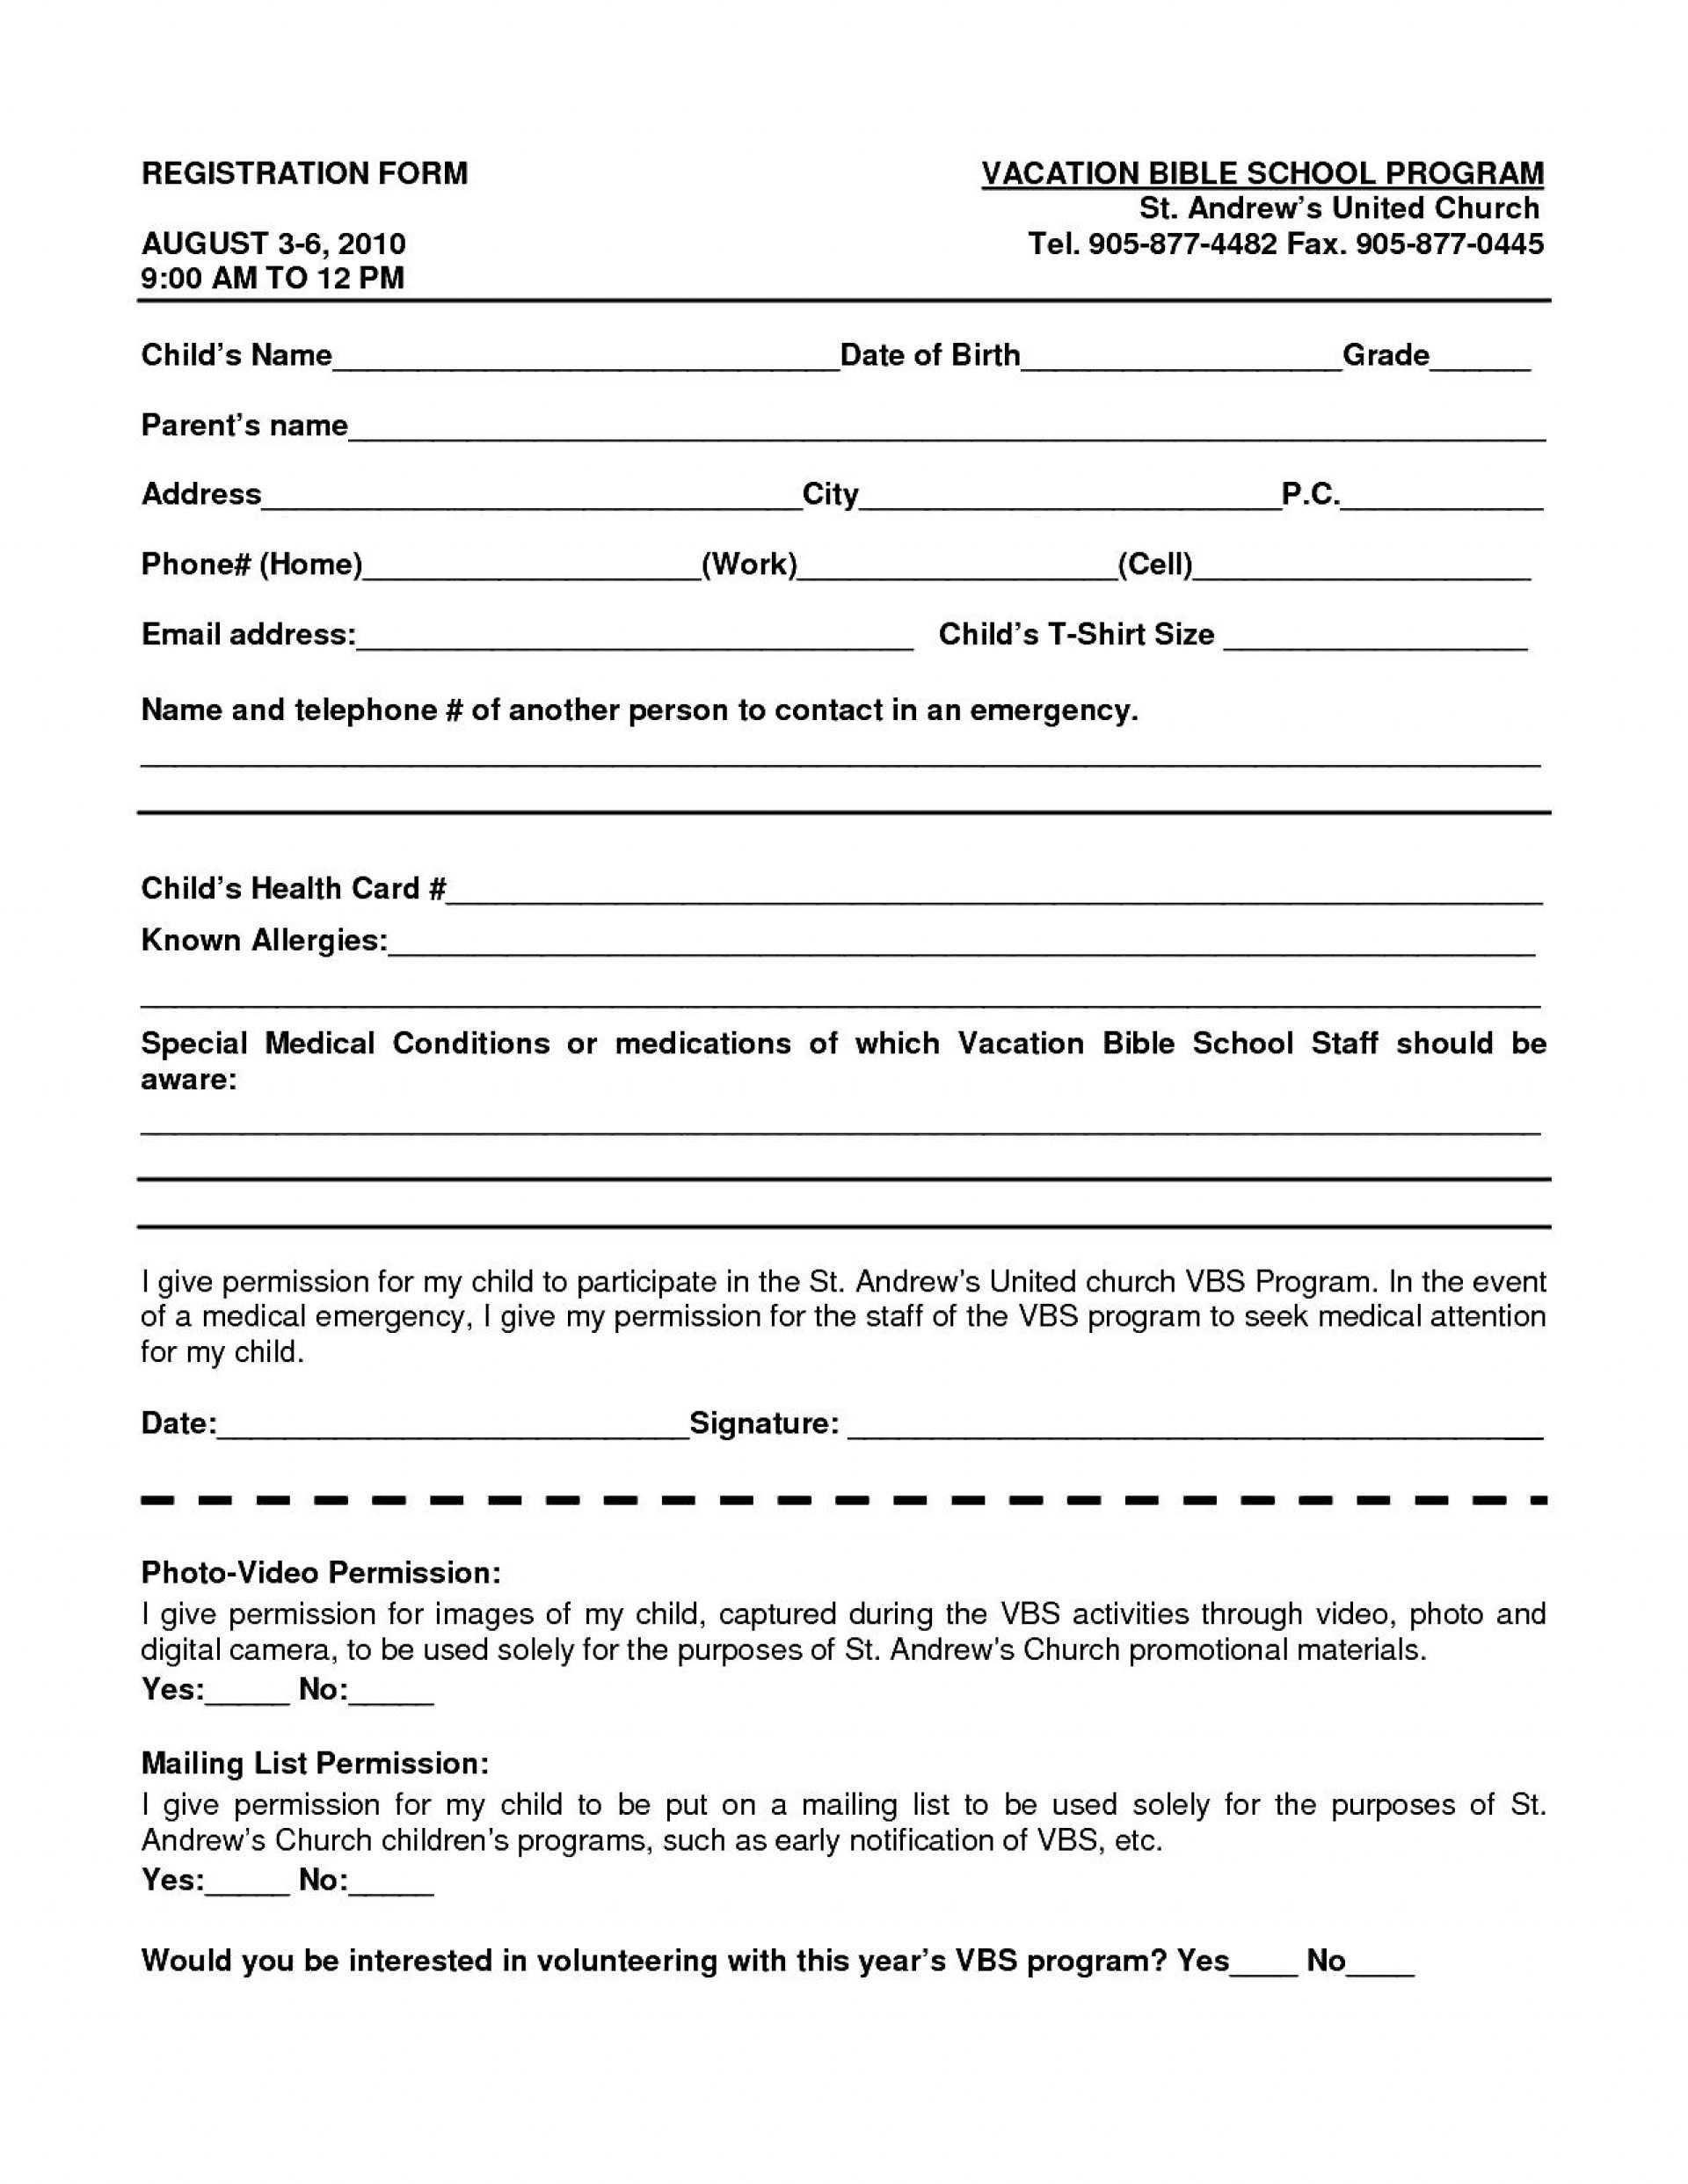 023 School Registration Form Template Word 102813 Ideas Free Throughout School Registration Form Template Word